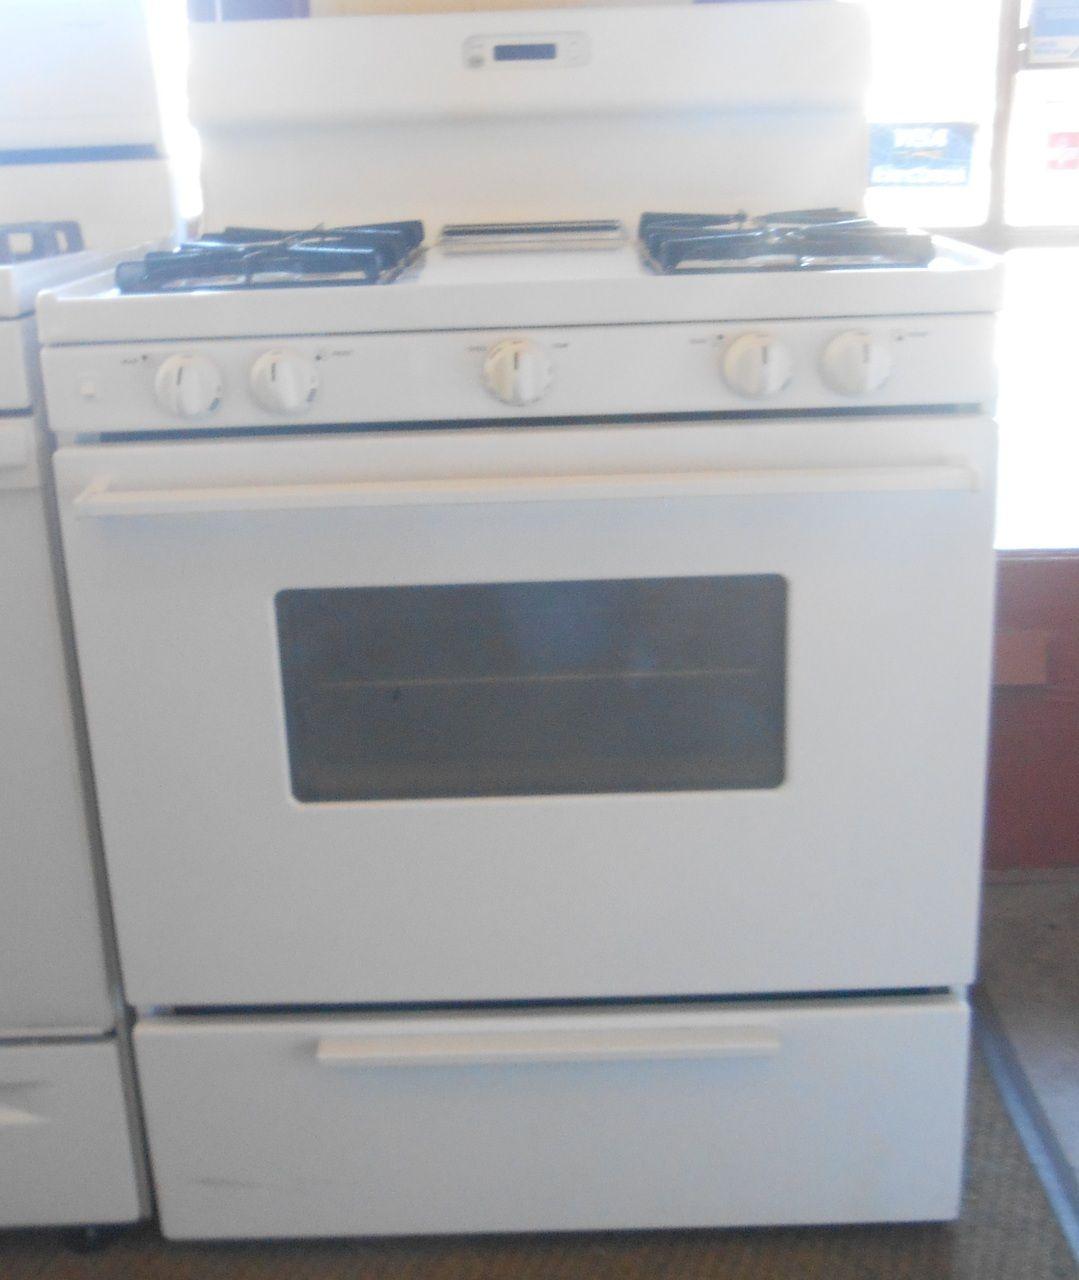 Appliance City - KENMORE GAS RANGE 30 INCH FREE STANDING 4 BURNER ...